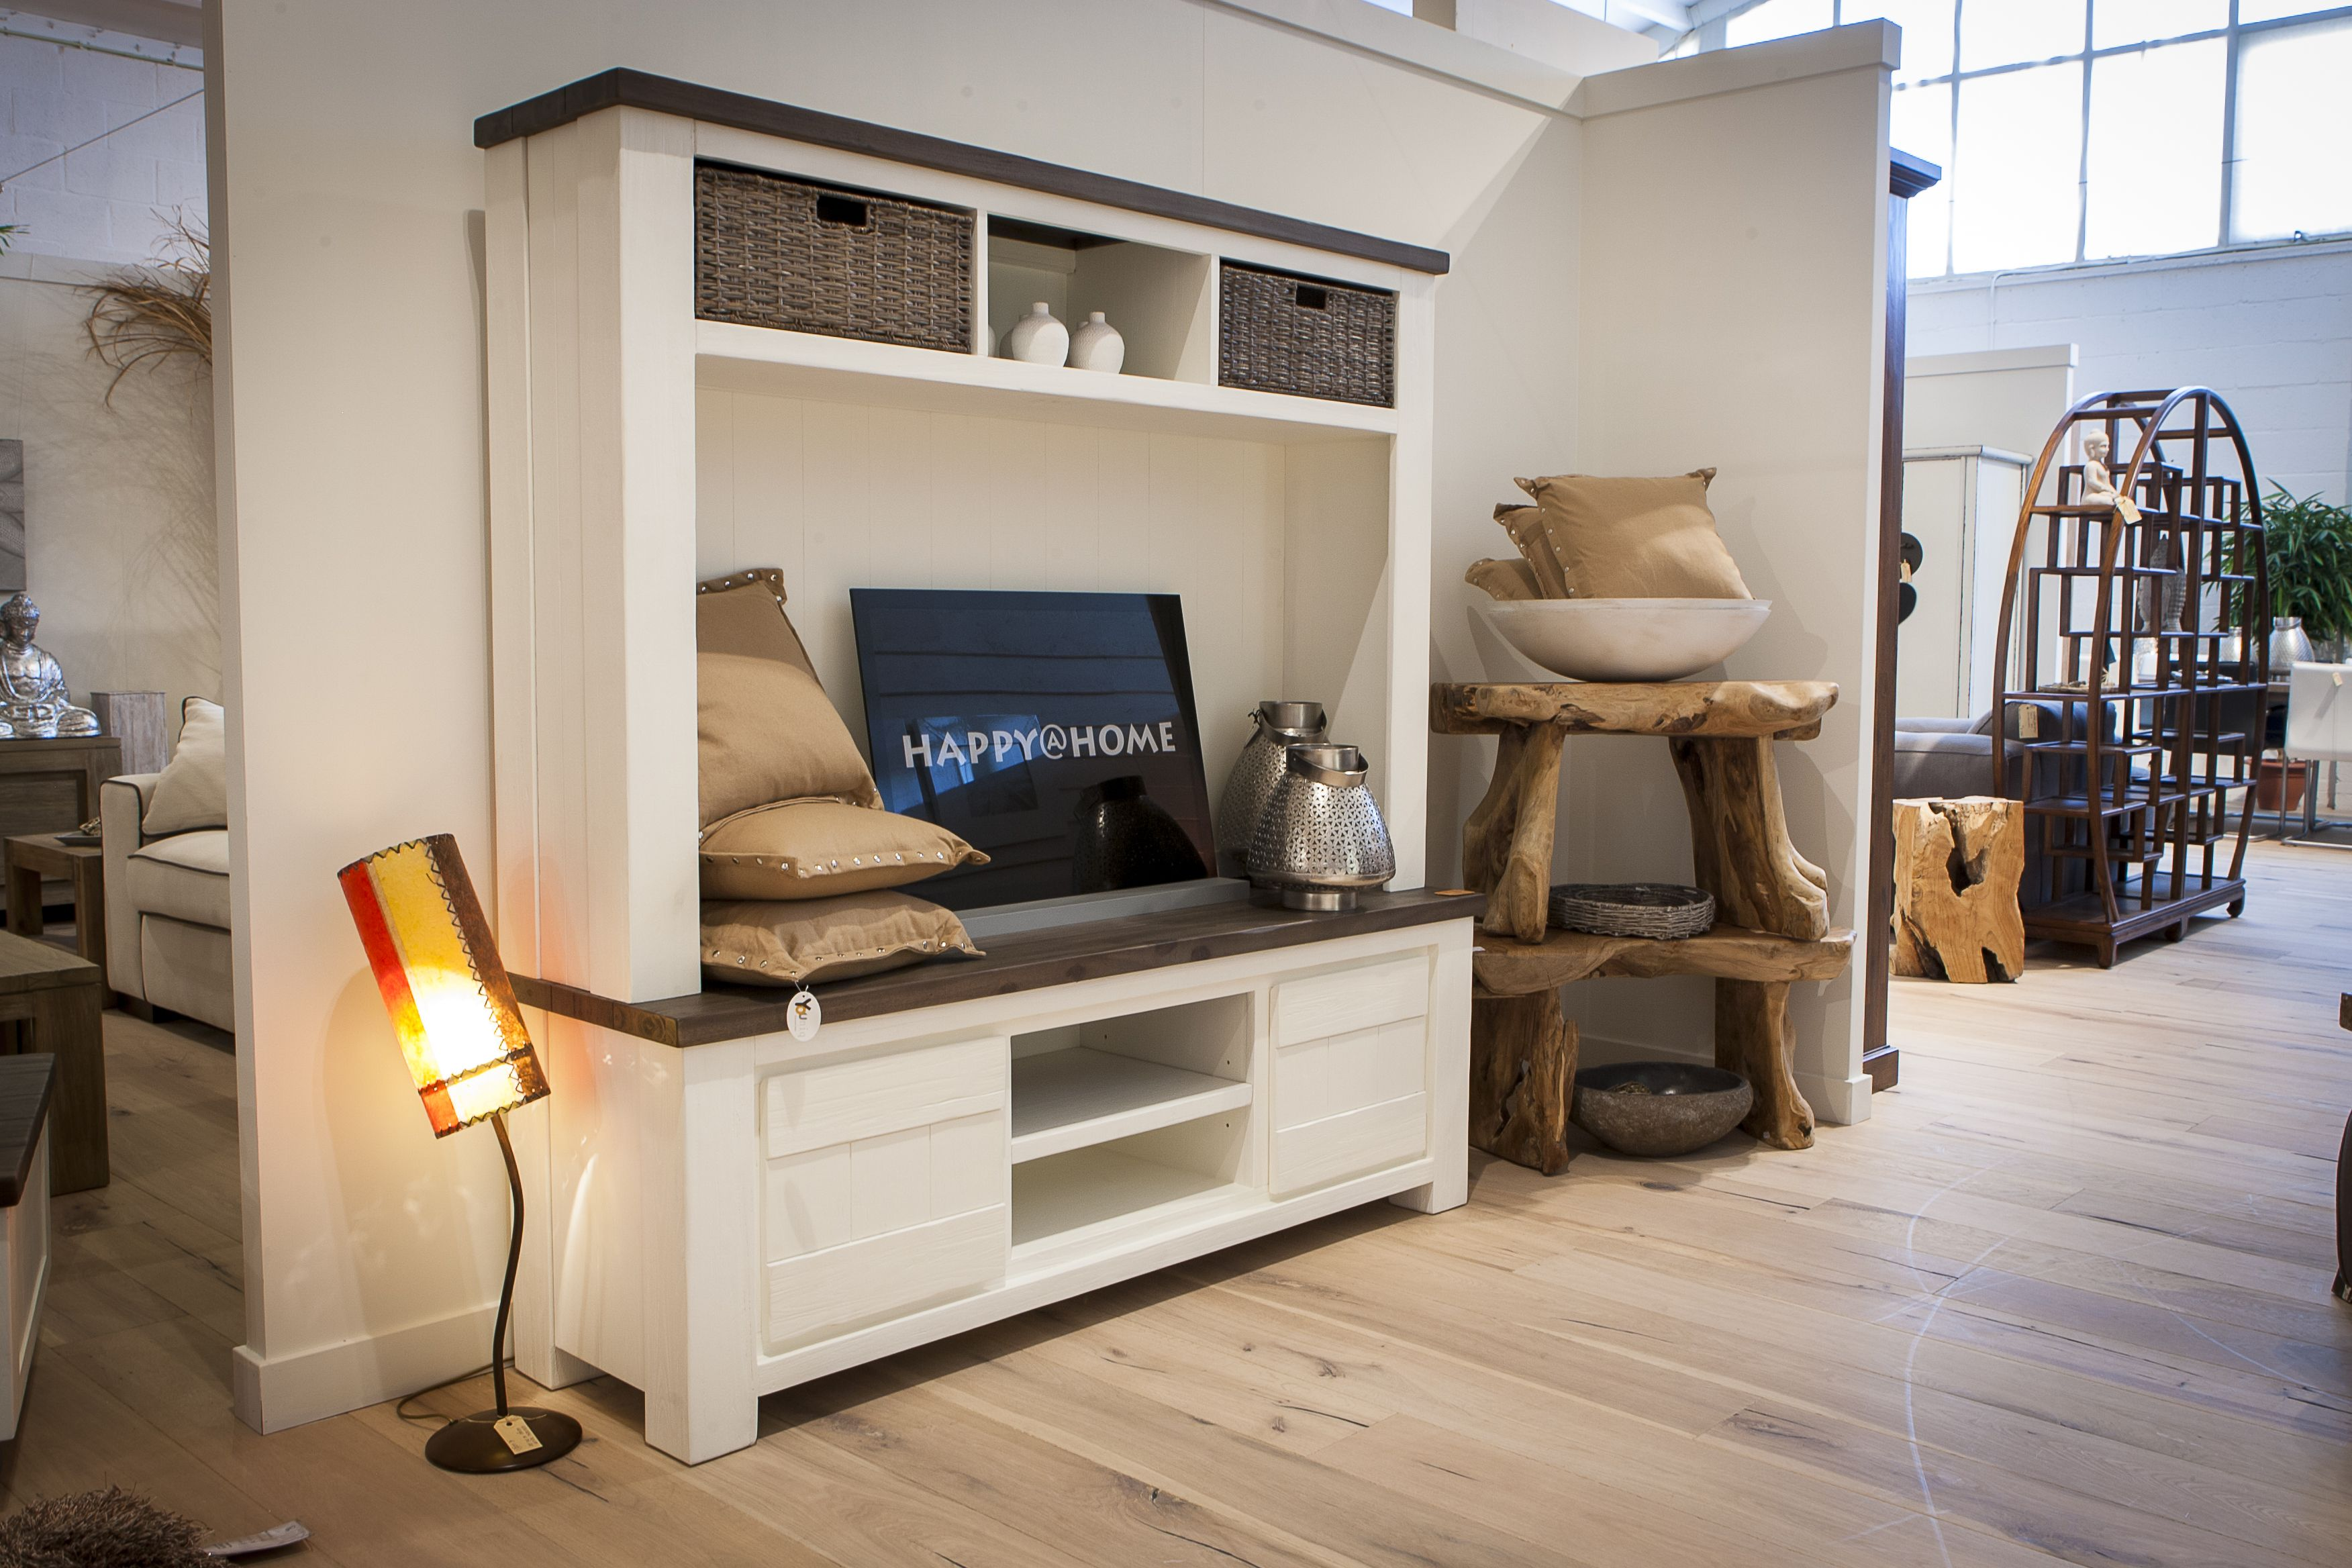 Landelijke meubelen Deaumain. TV kast Deaumain Happy at Home http ...